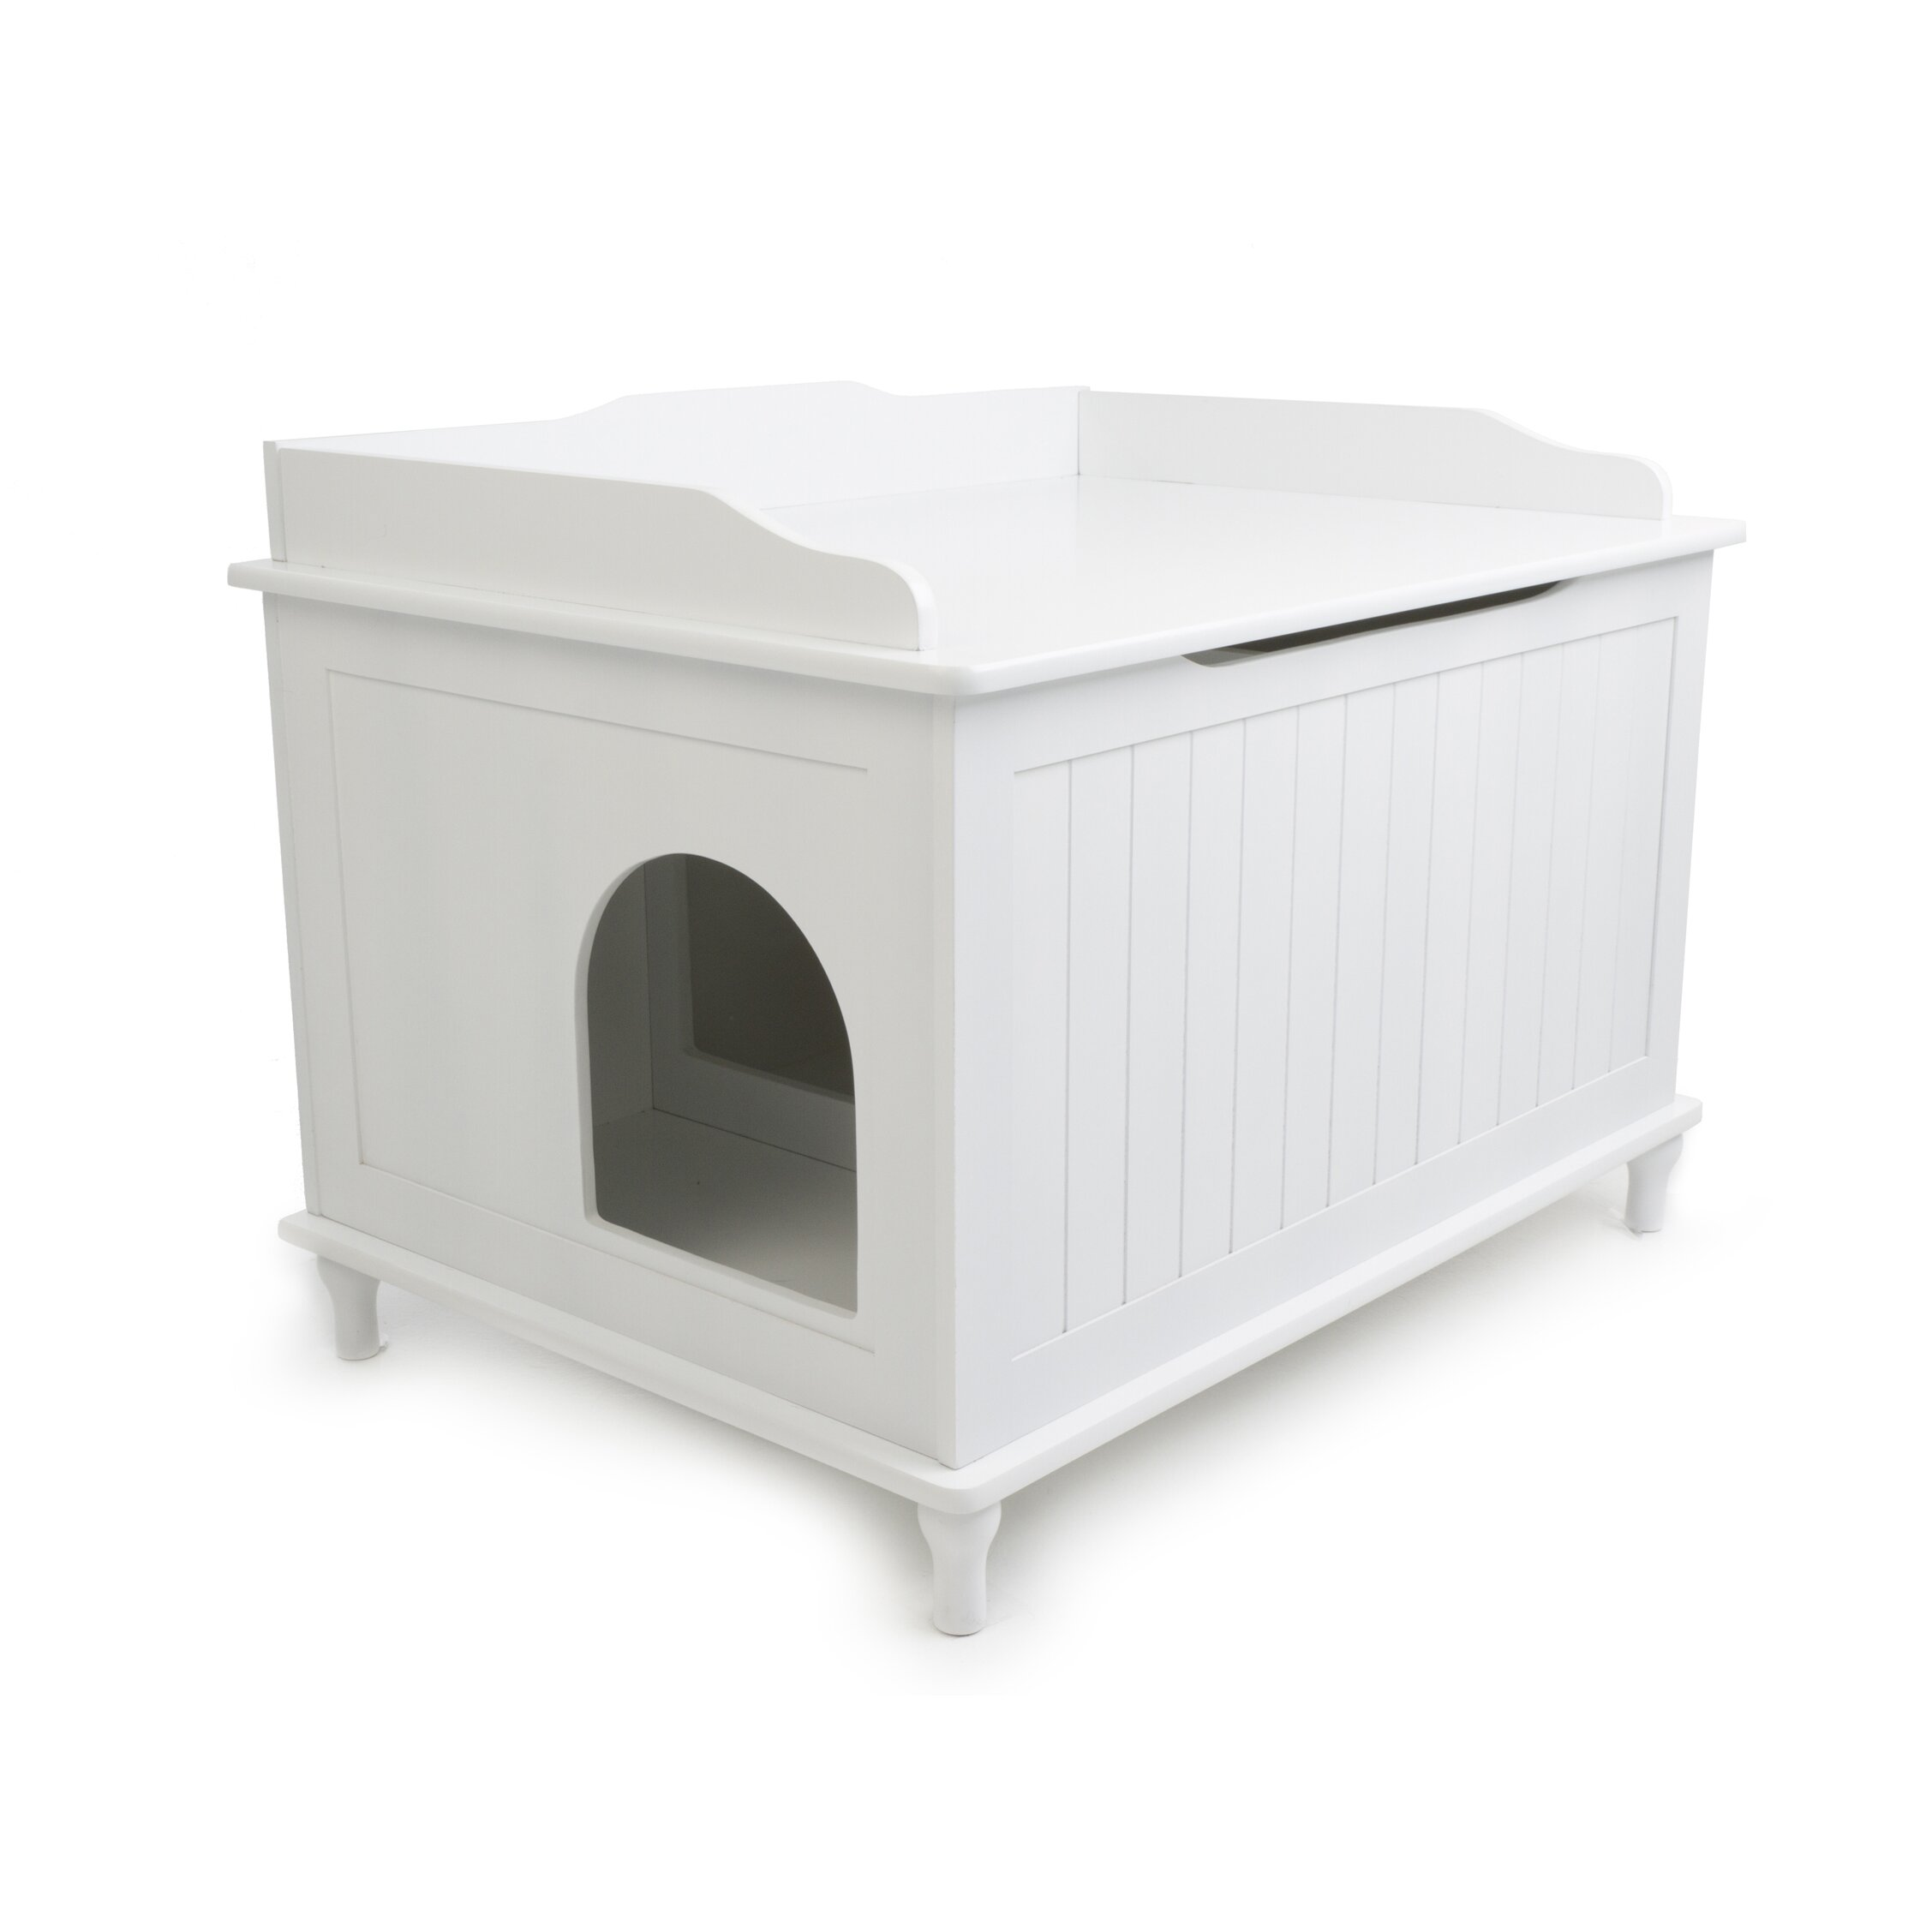 Wooden Litter Box Cabinets Designer Pet Products Mia Litter Box Enclosure Reviews Wayfair